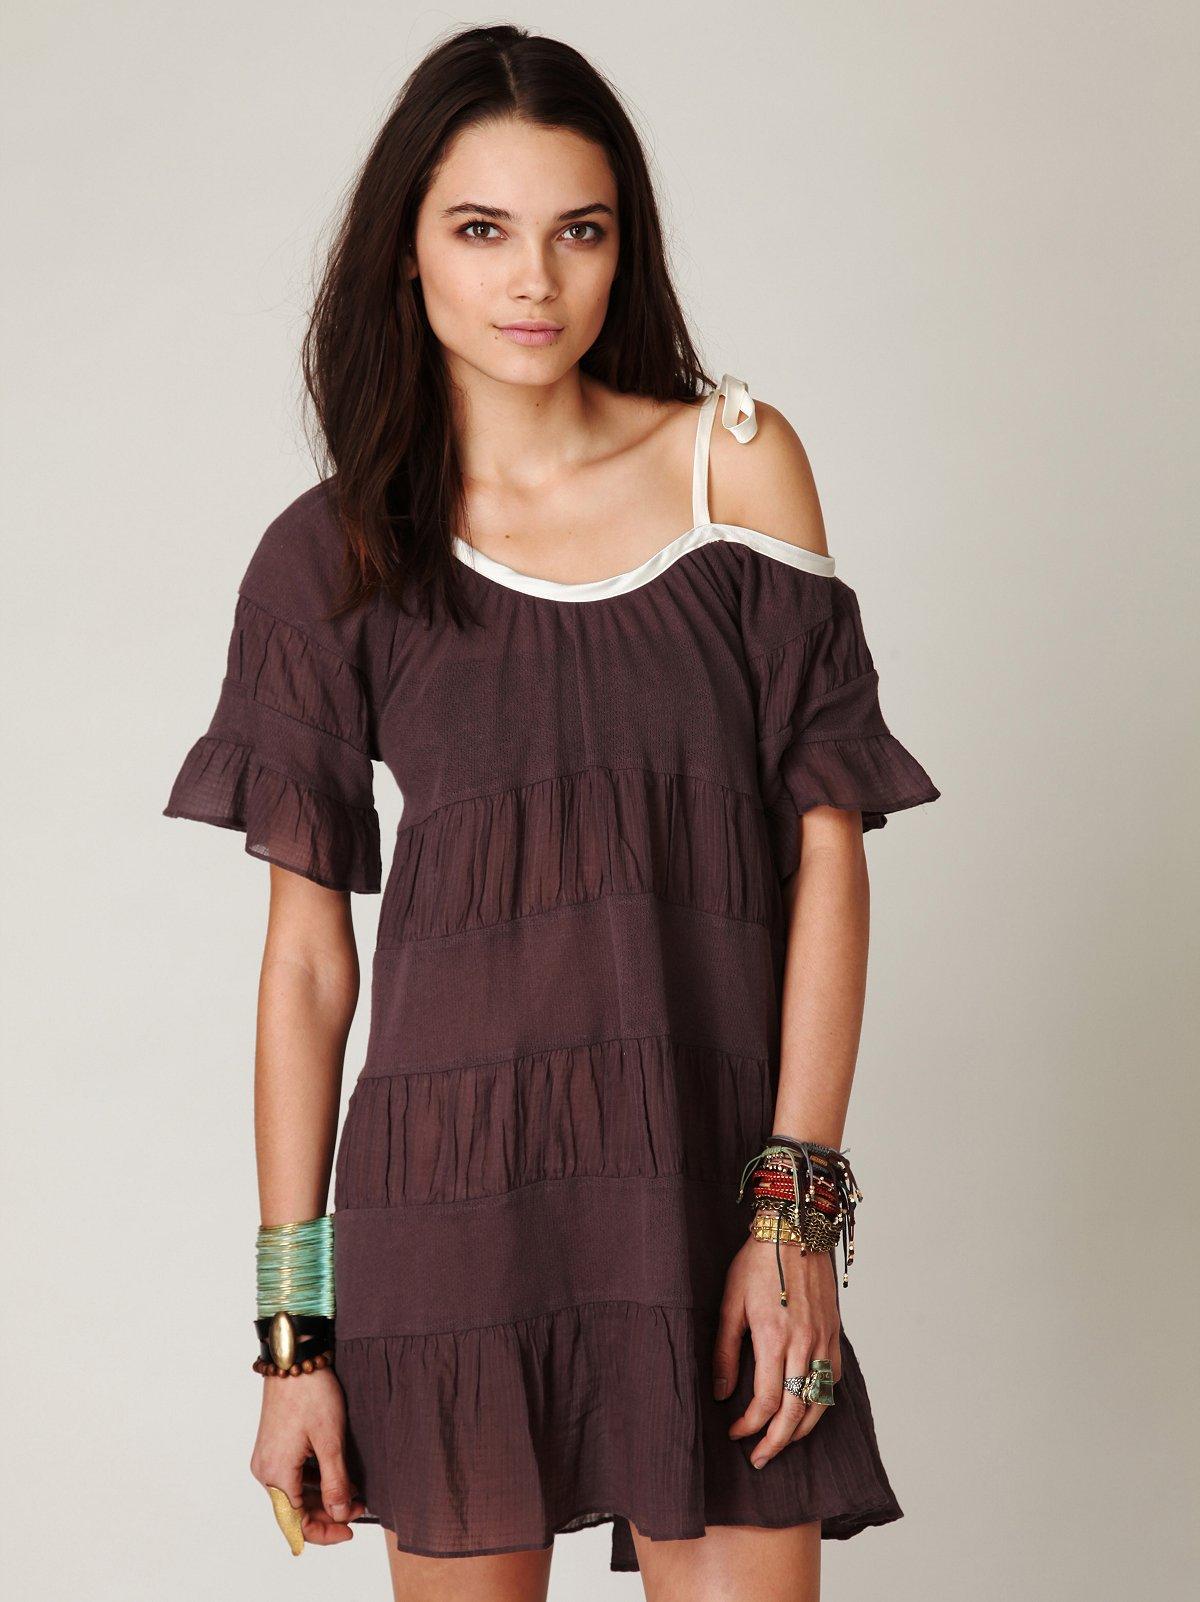 Textured Hi-Low Tunic Dress